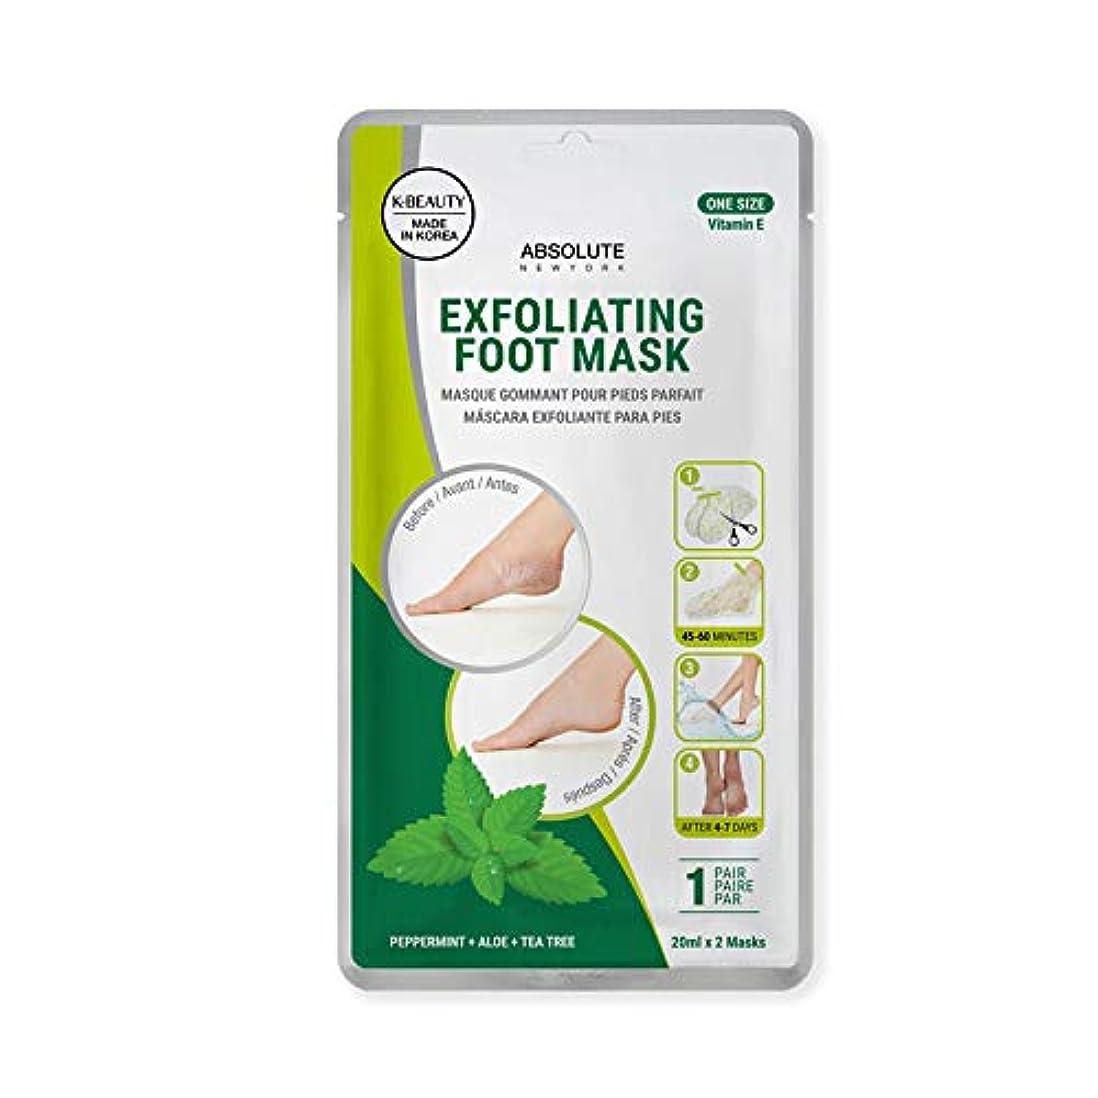 原油煙突花婿(3 Pack) ABSOLUTE Exfoliating Foot Mask - Peppermint + Aloe + Tea Tree (並行輸入品)